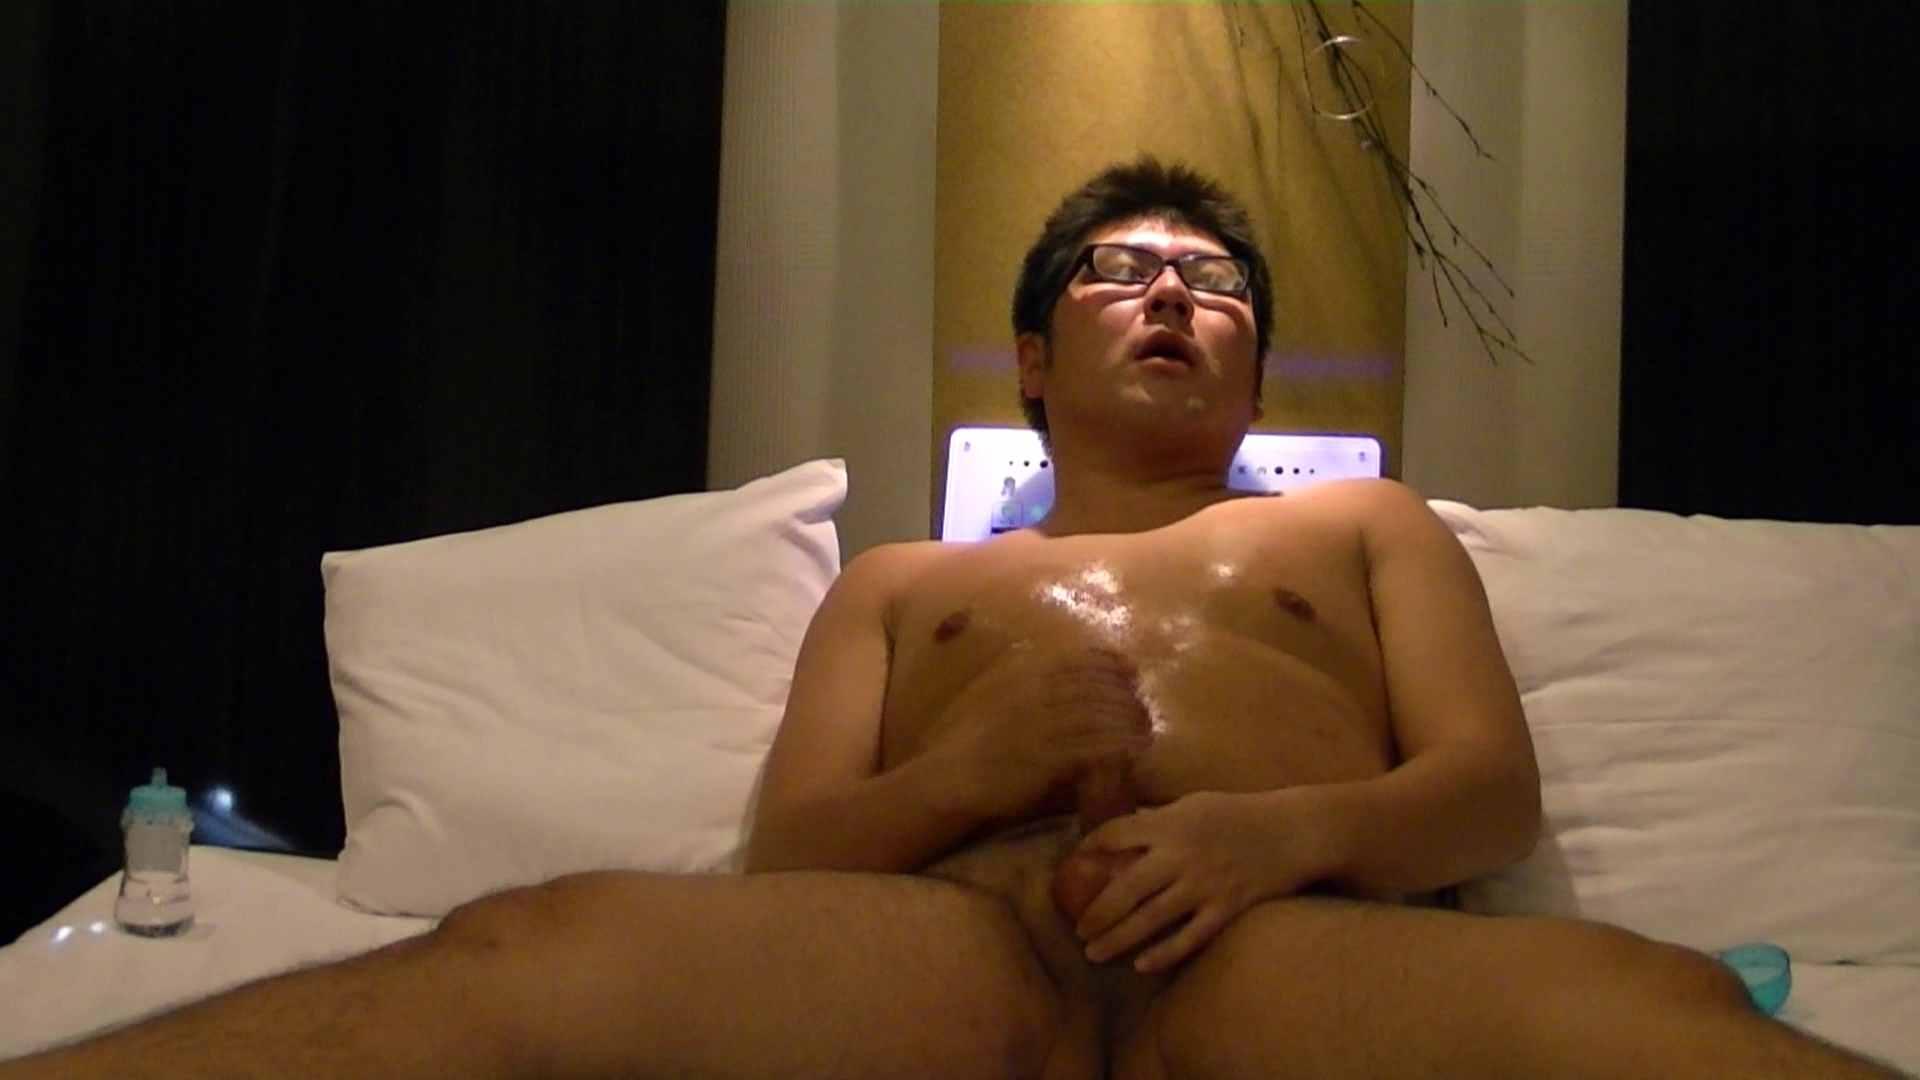 Mr.オナックスさん投稿!HD 貴方のオナニー三万円で撮影させてください。VOL.03 後編 完全無修正でお届け | オナニー特集  83pic 26